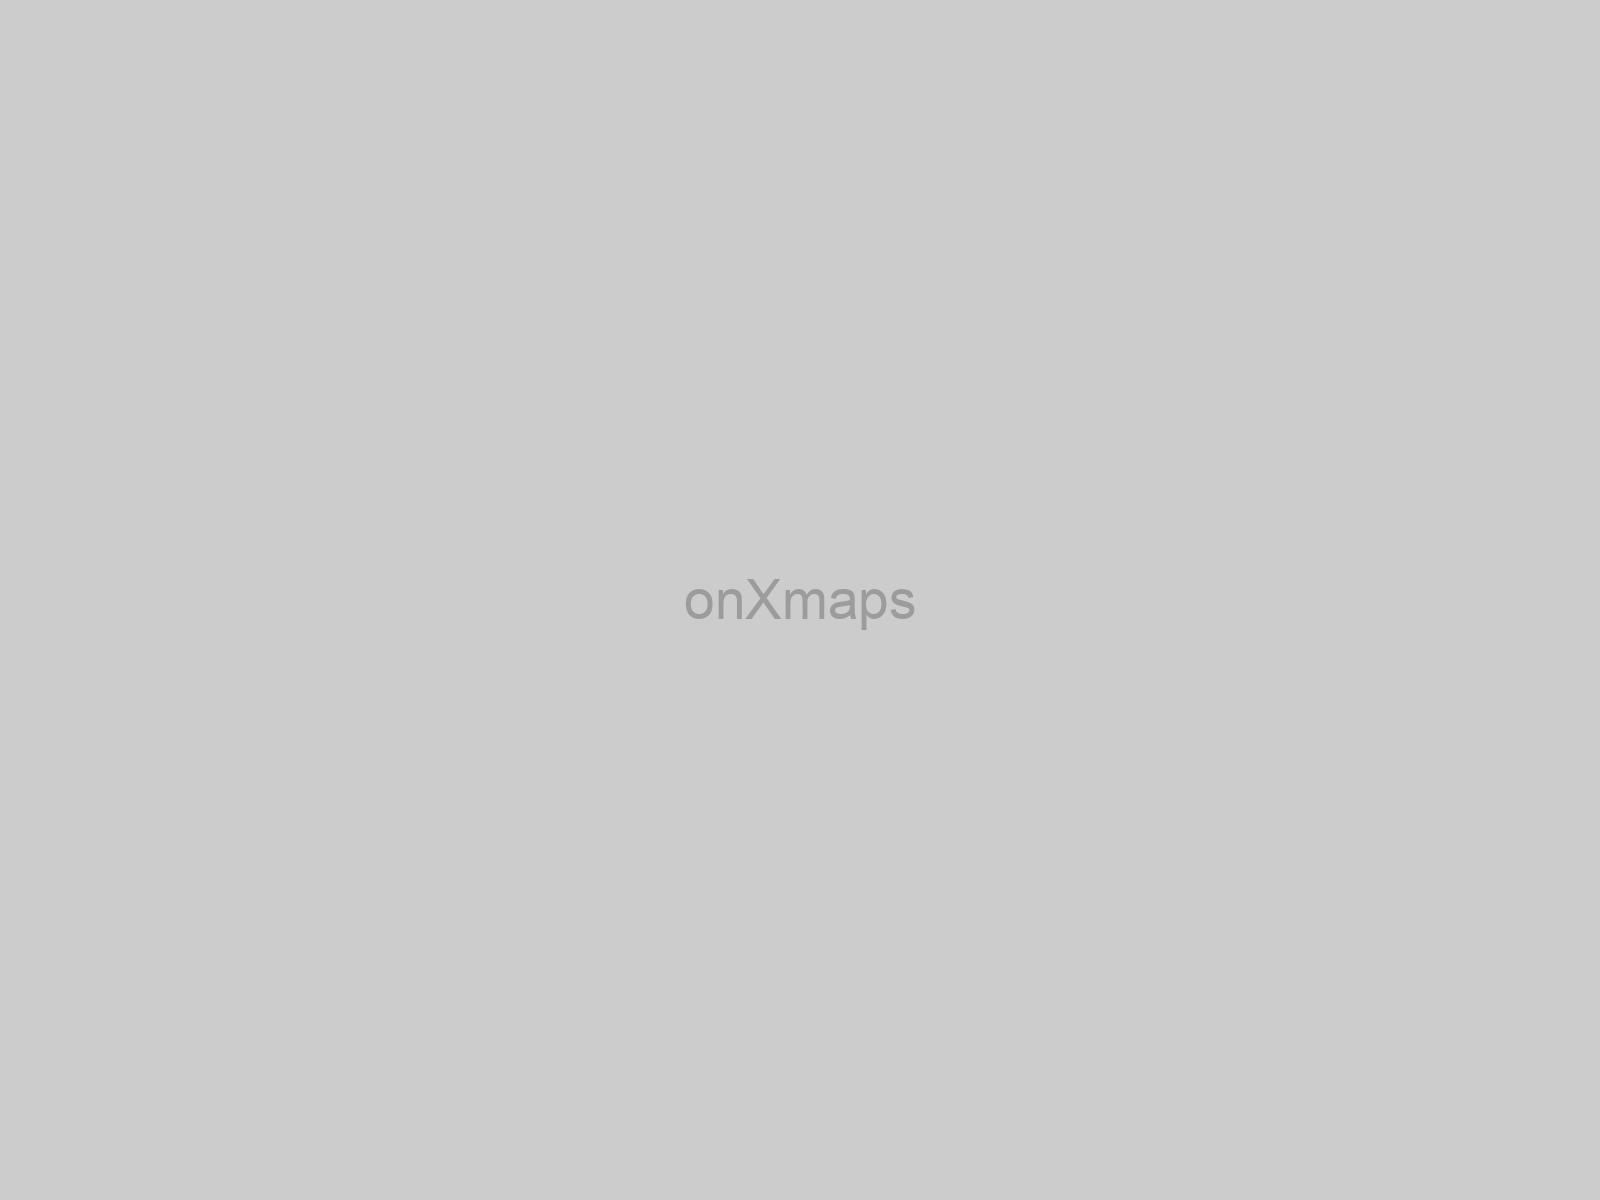 onXmaps